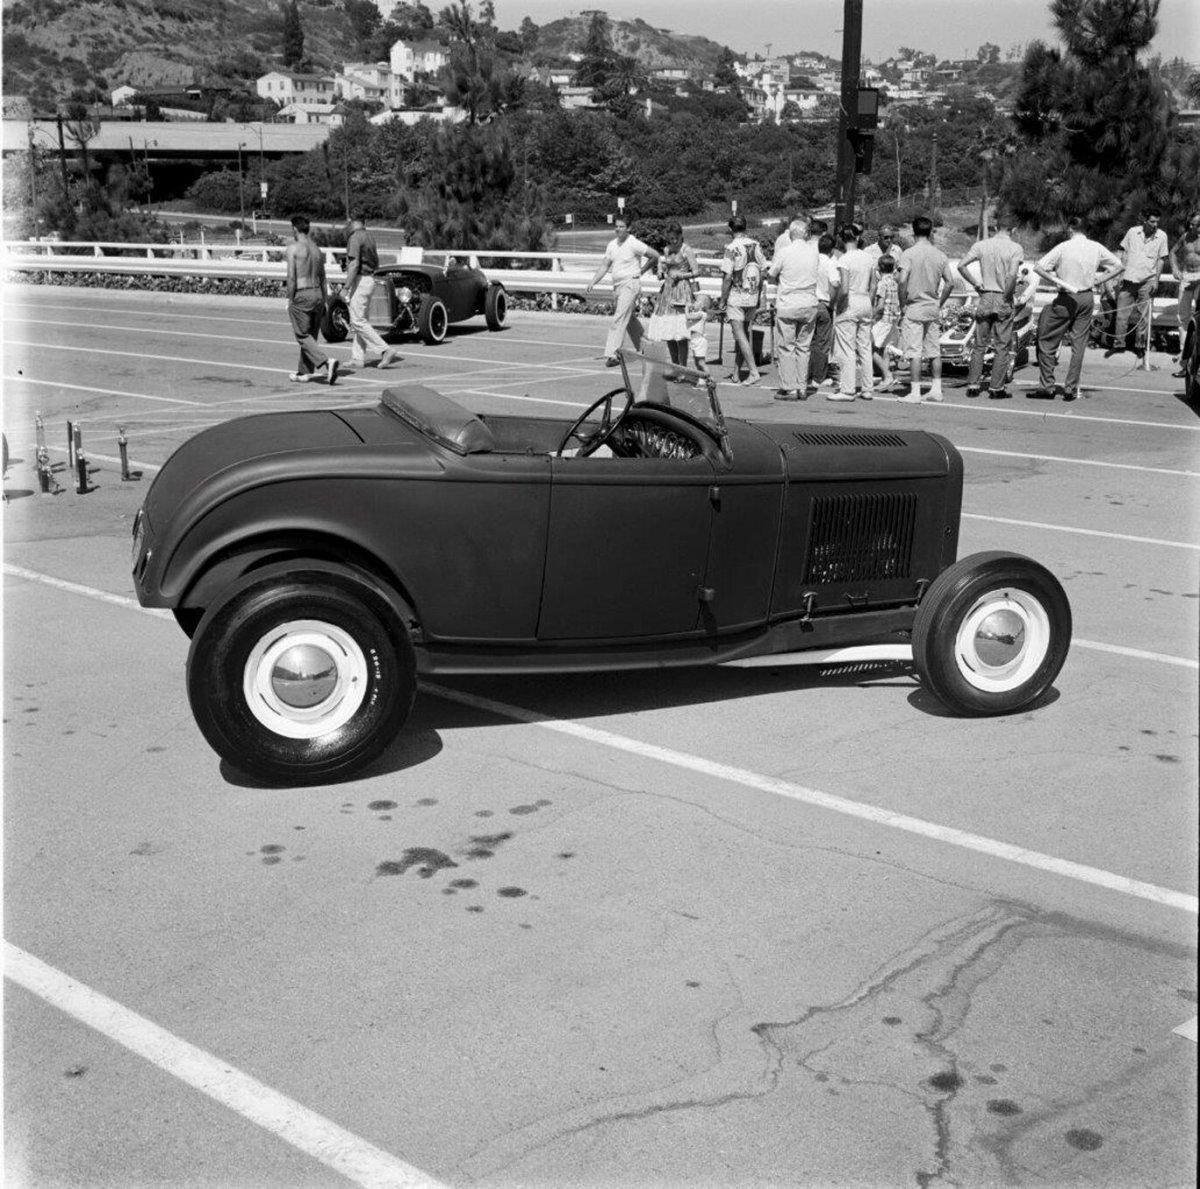 007-2015-la-roadster-show-1960-show-sunday.jpg